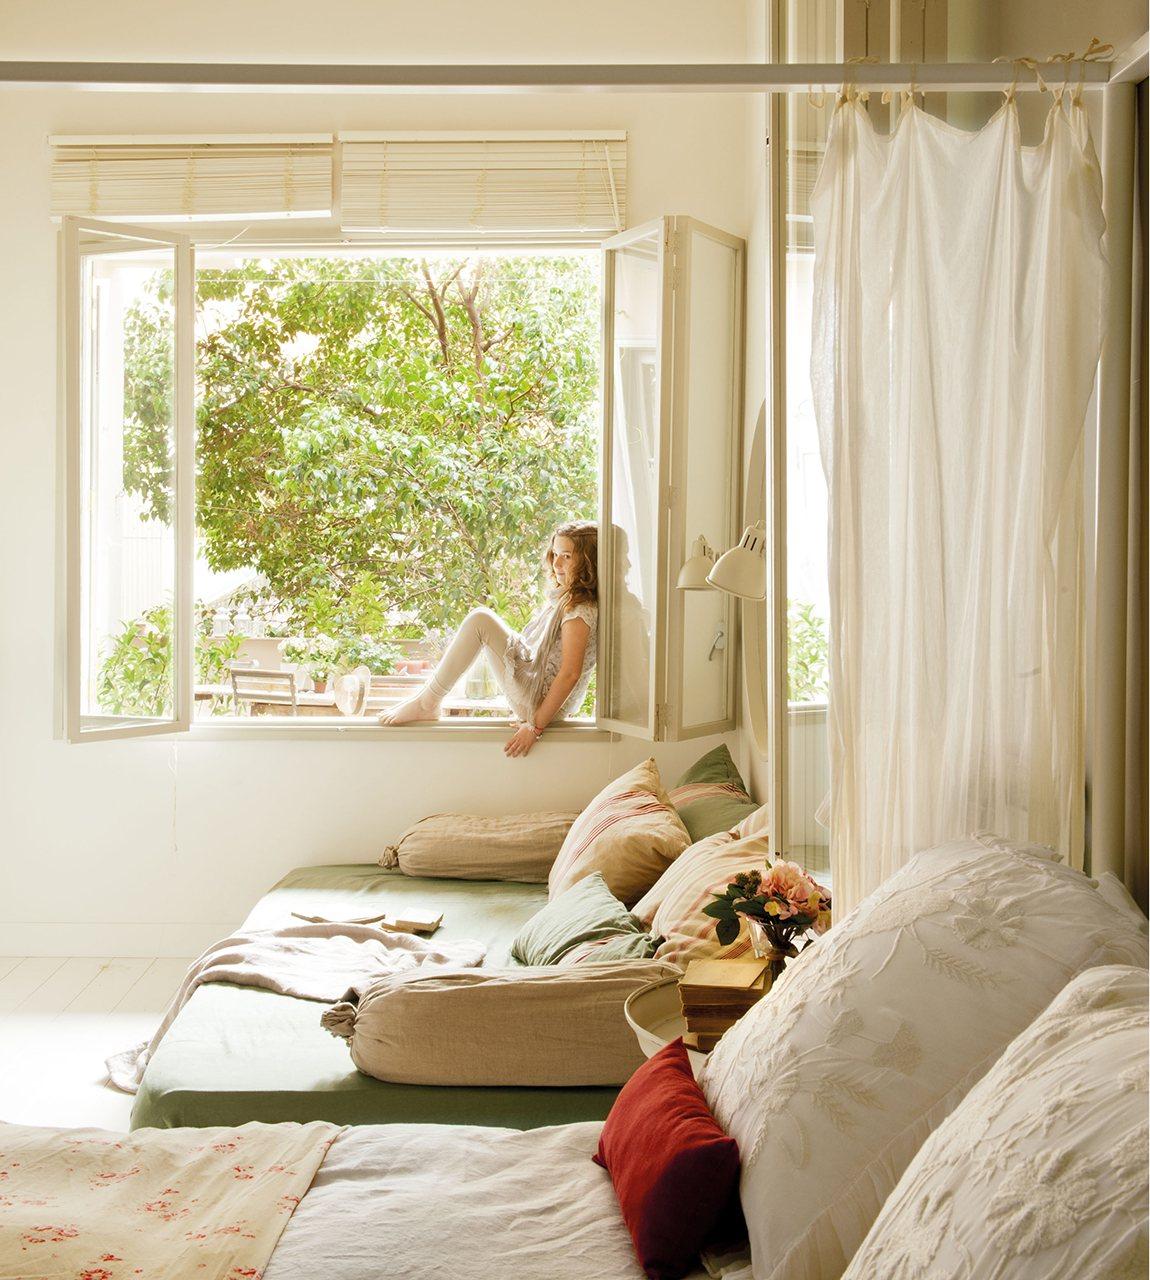 Ba o de asiento vinagre blanco - Dosel cama nina ...